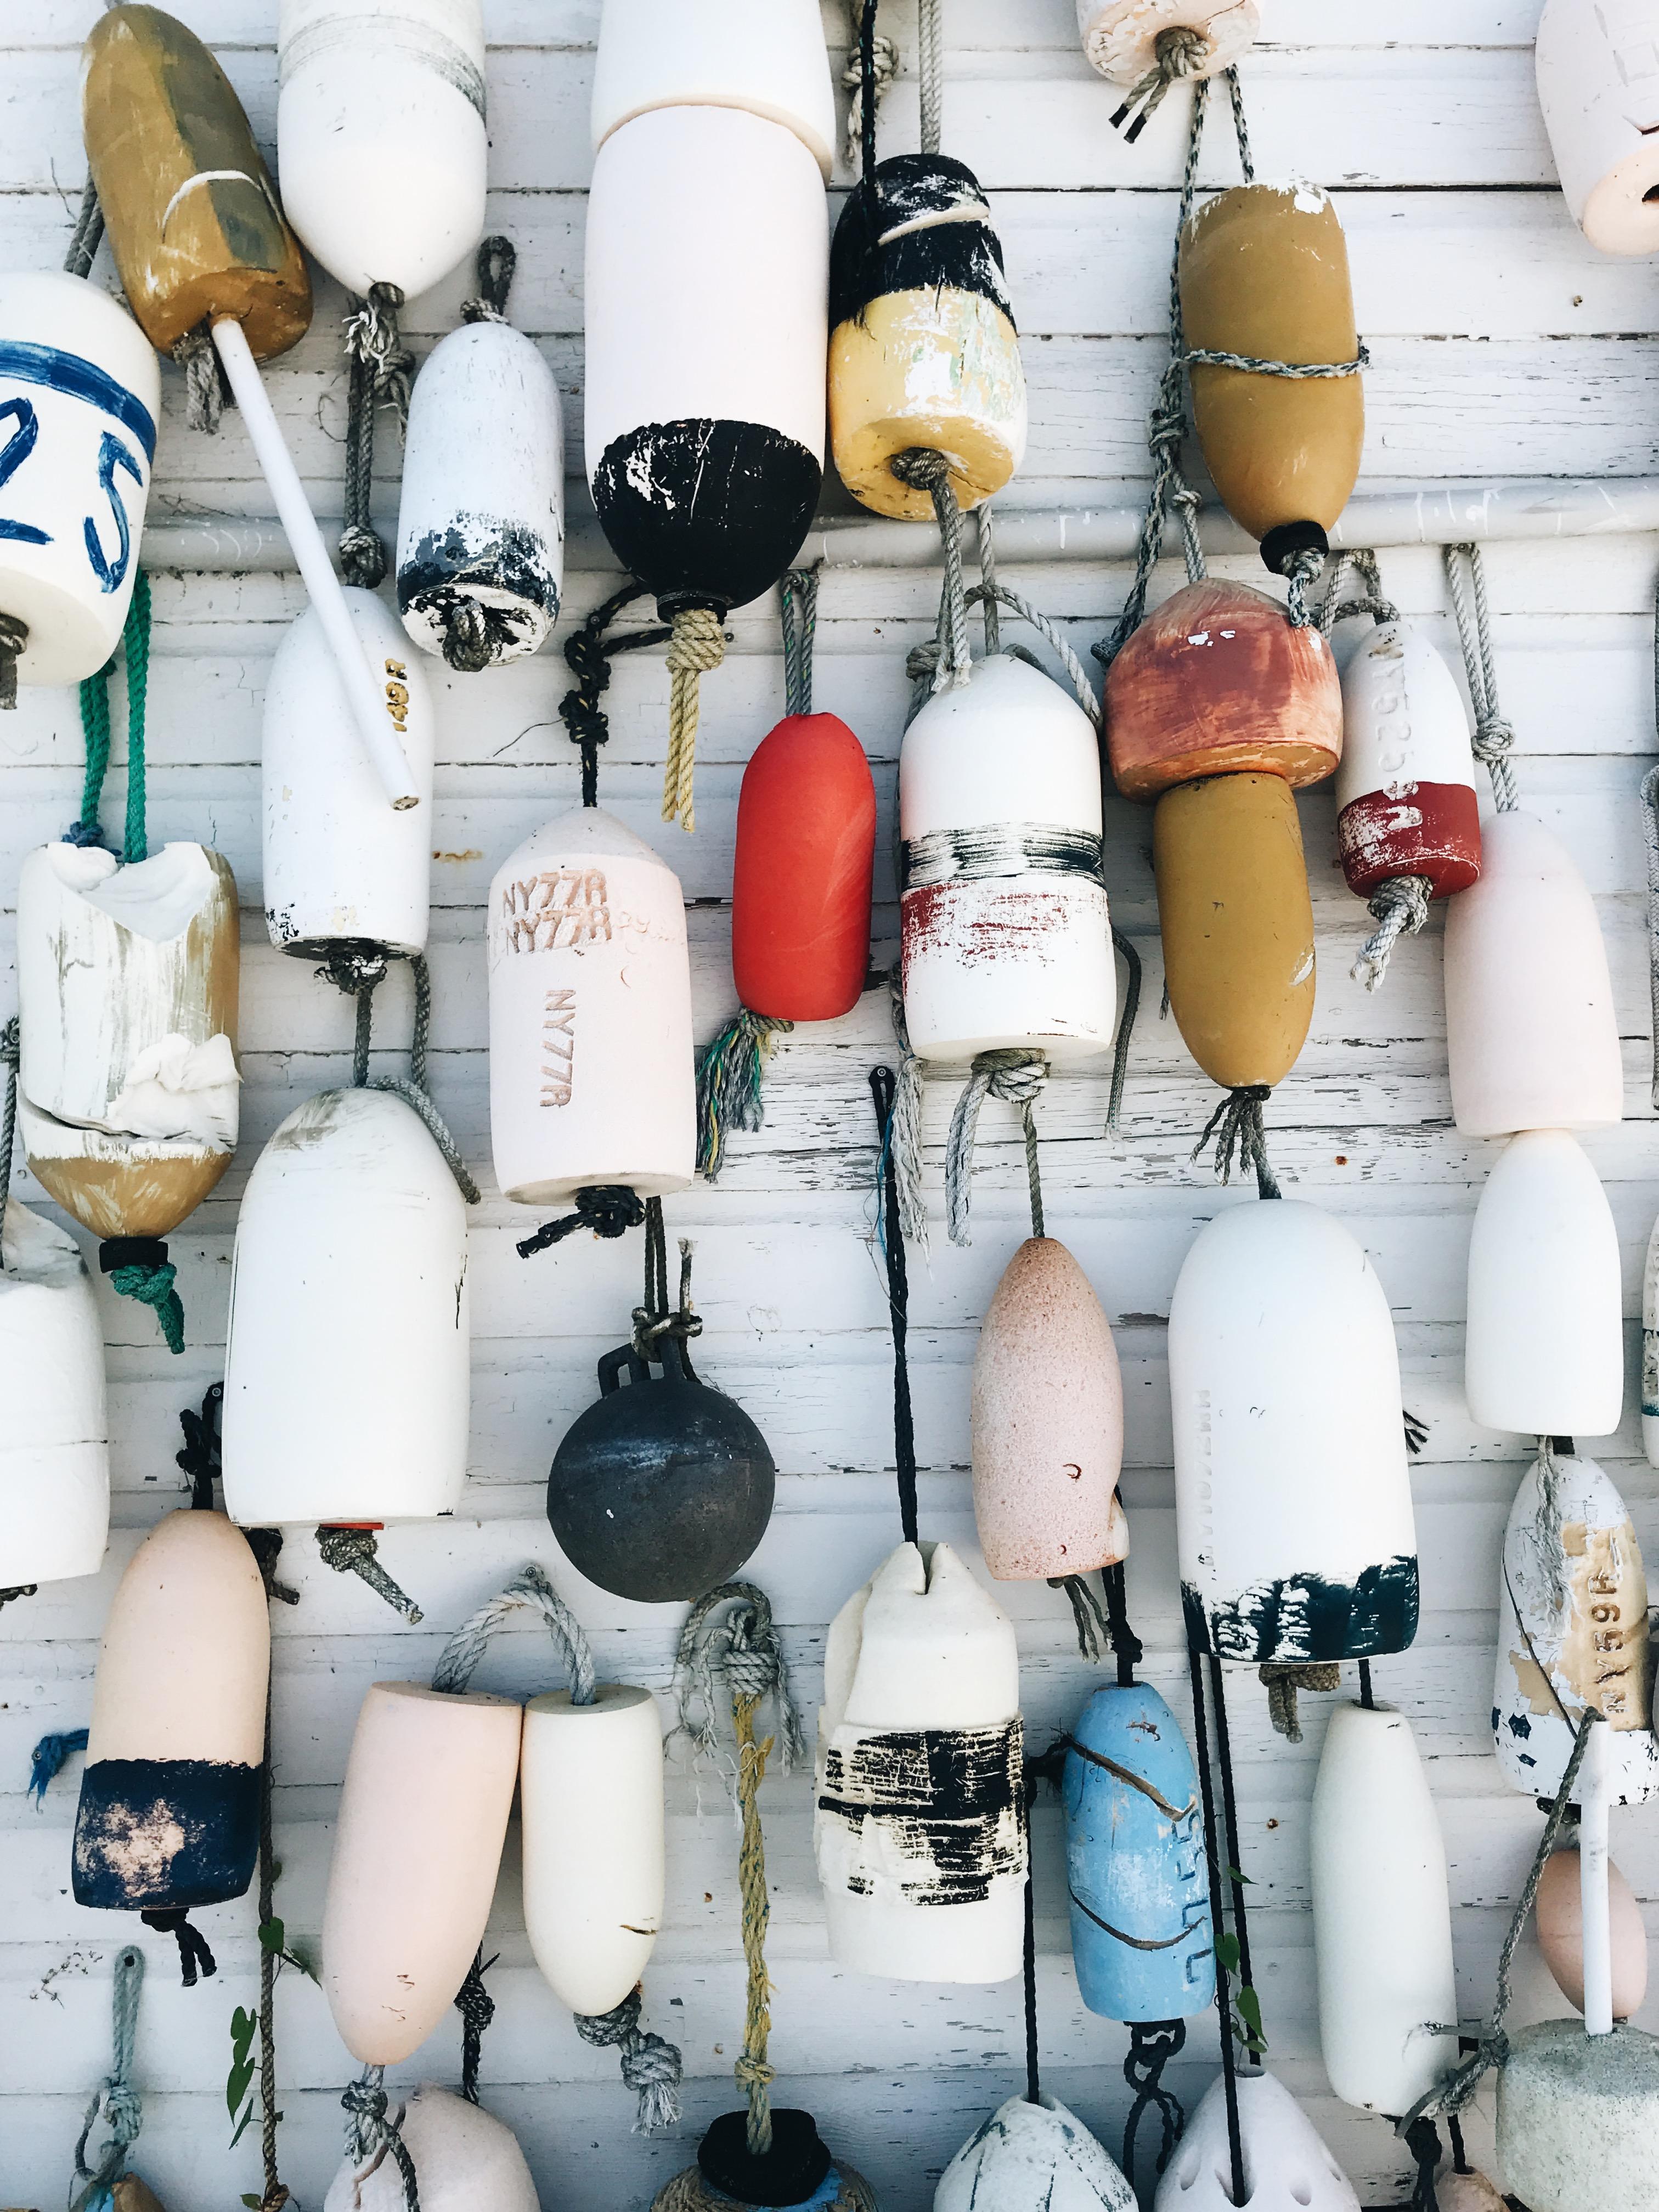 ford's buoys